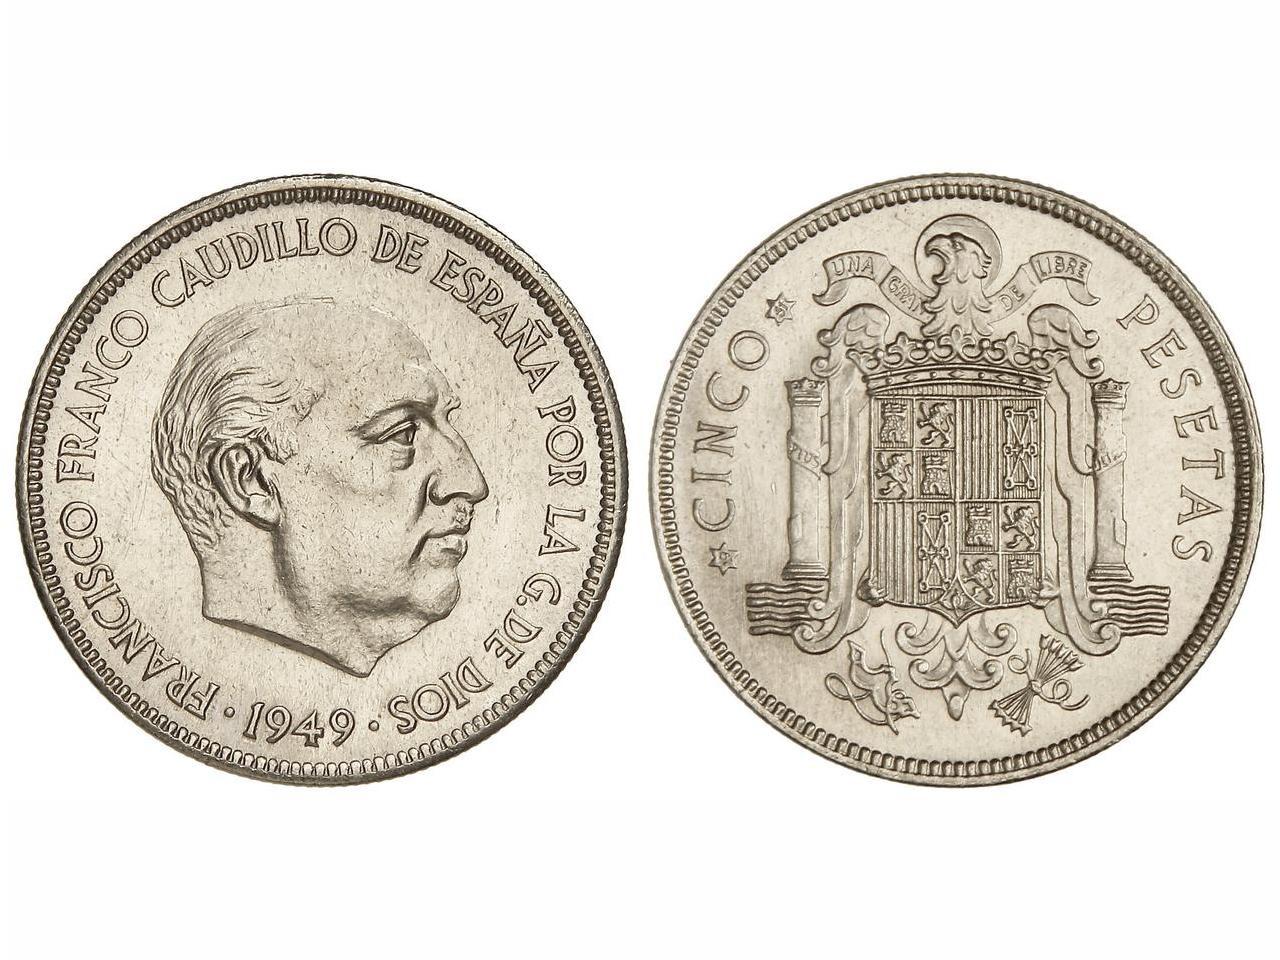 Estado Español 5 Pesetas 1949*51  Image